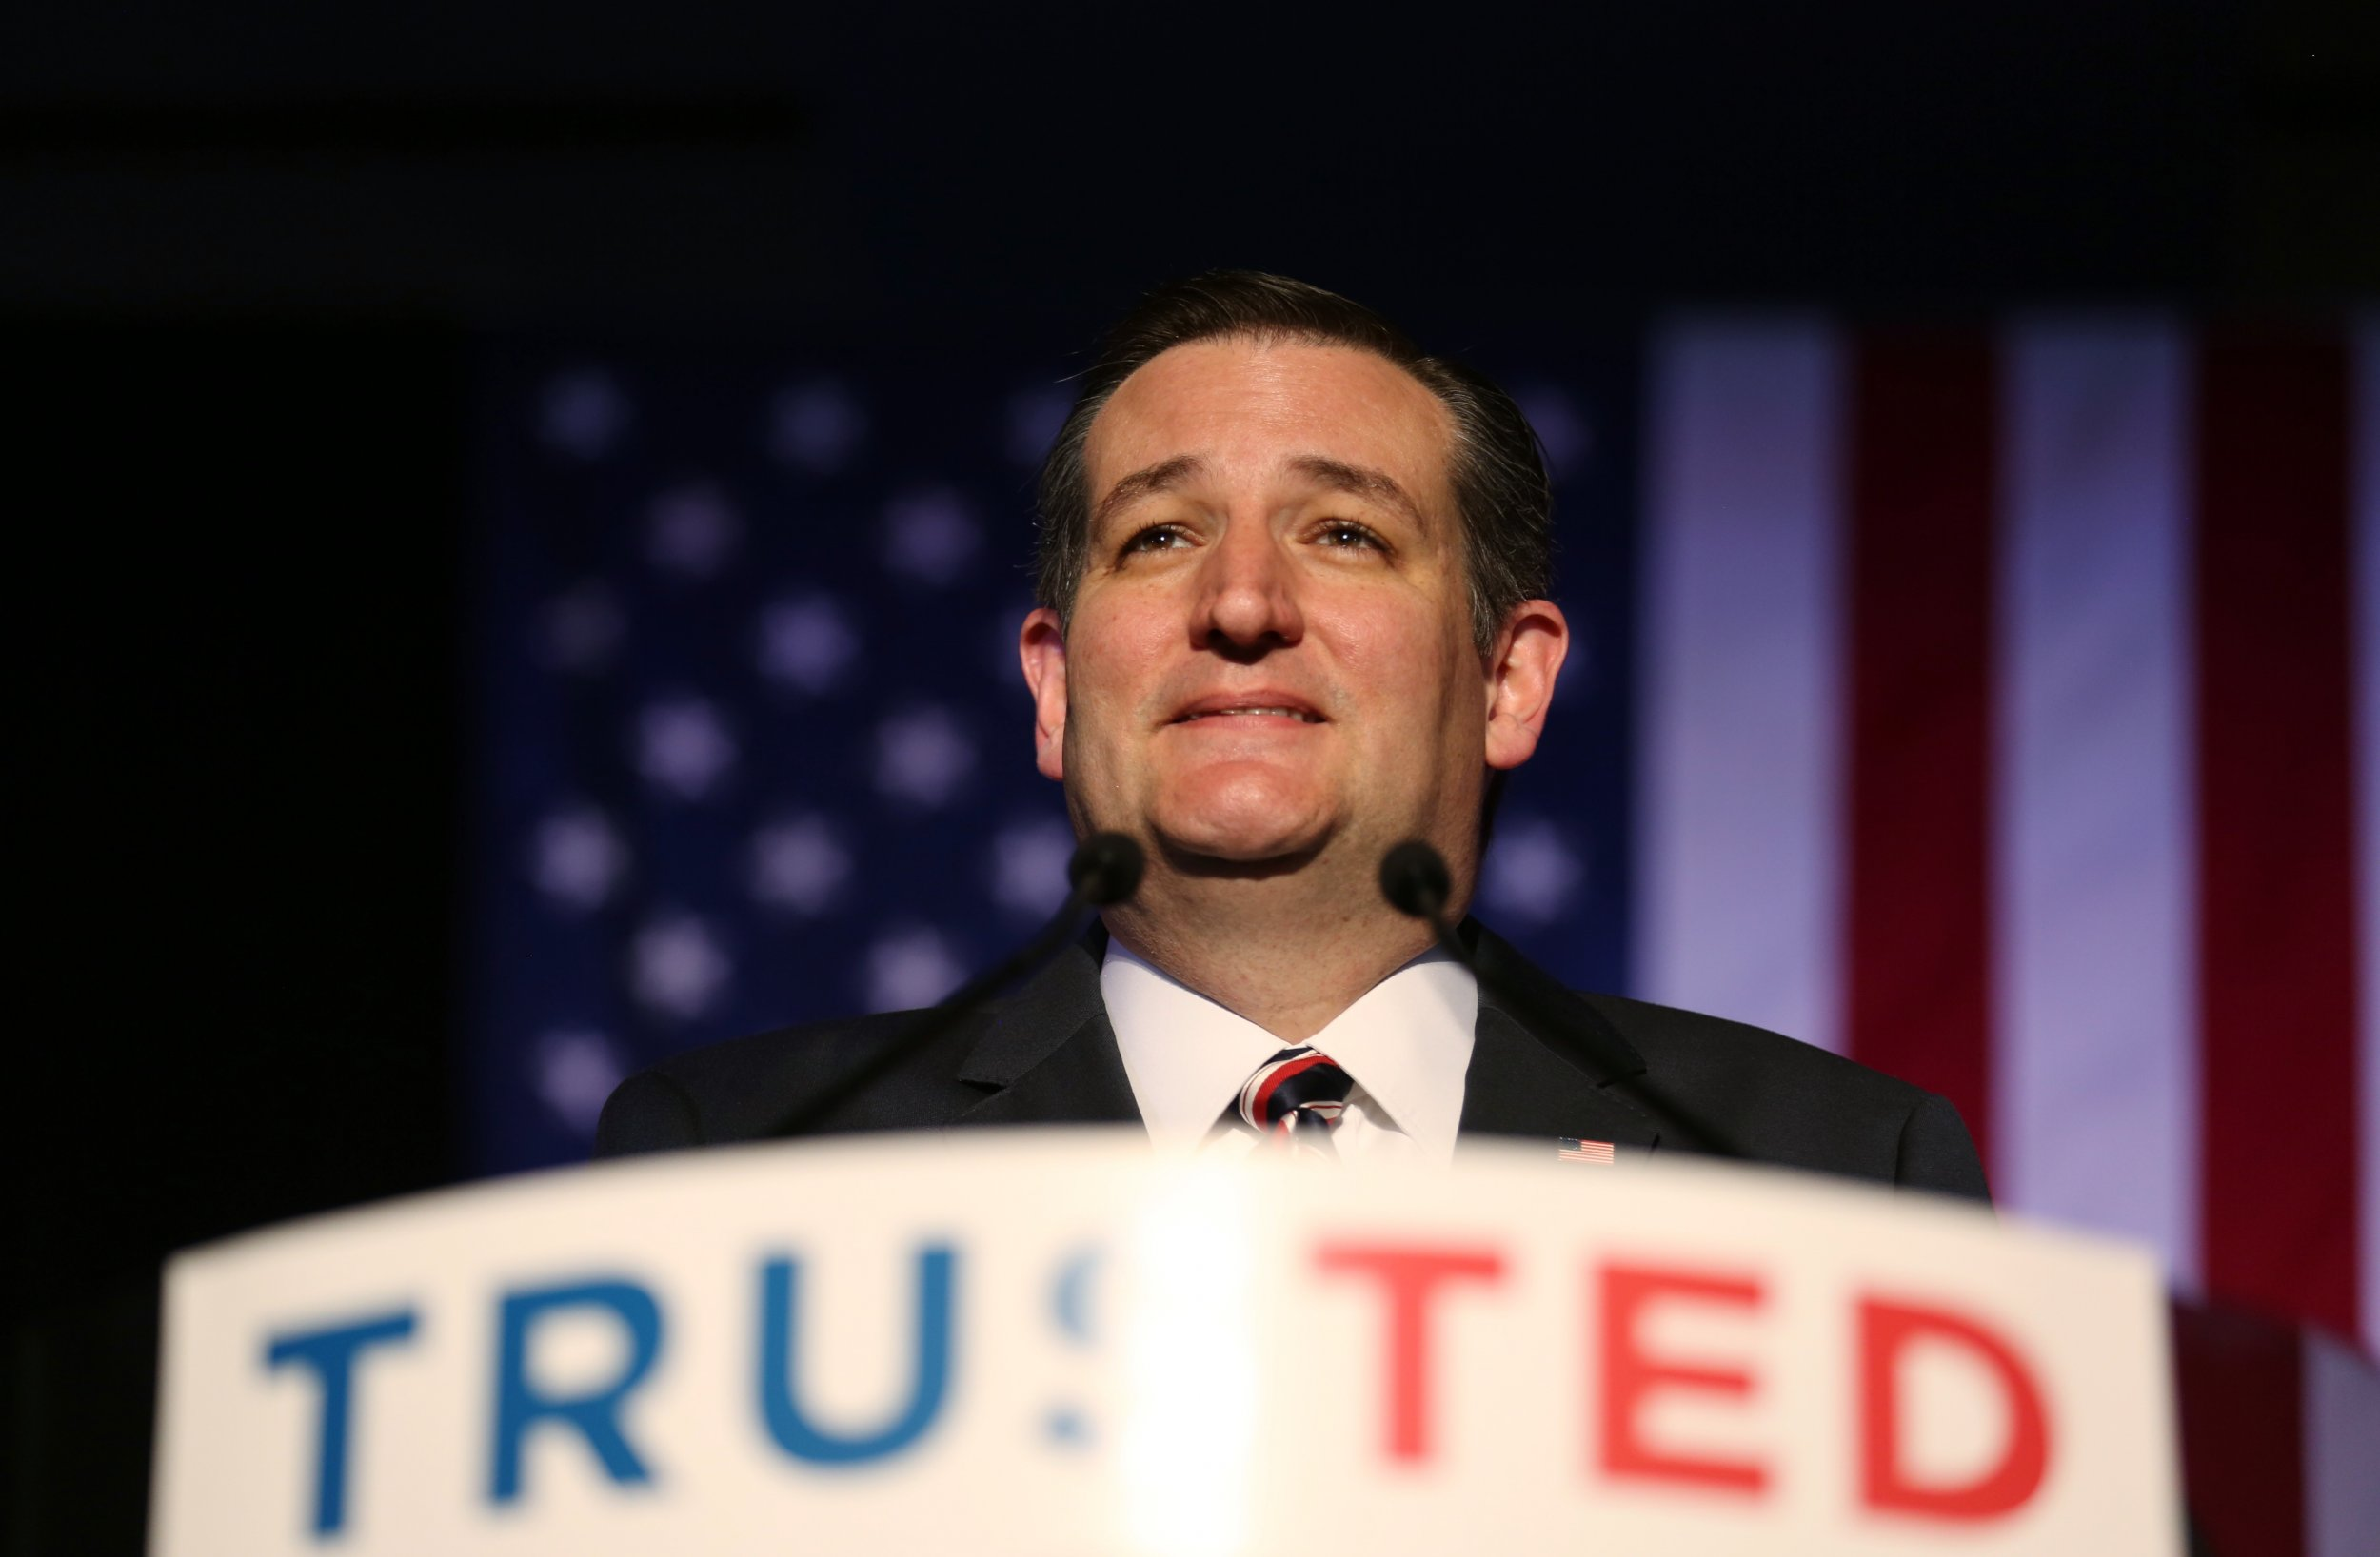 0317_Ted_Cruz_national_security_coalition_01